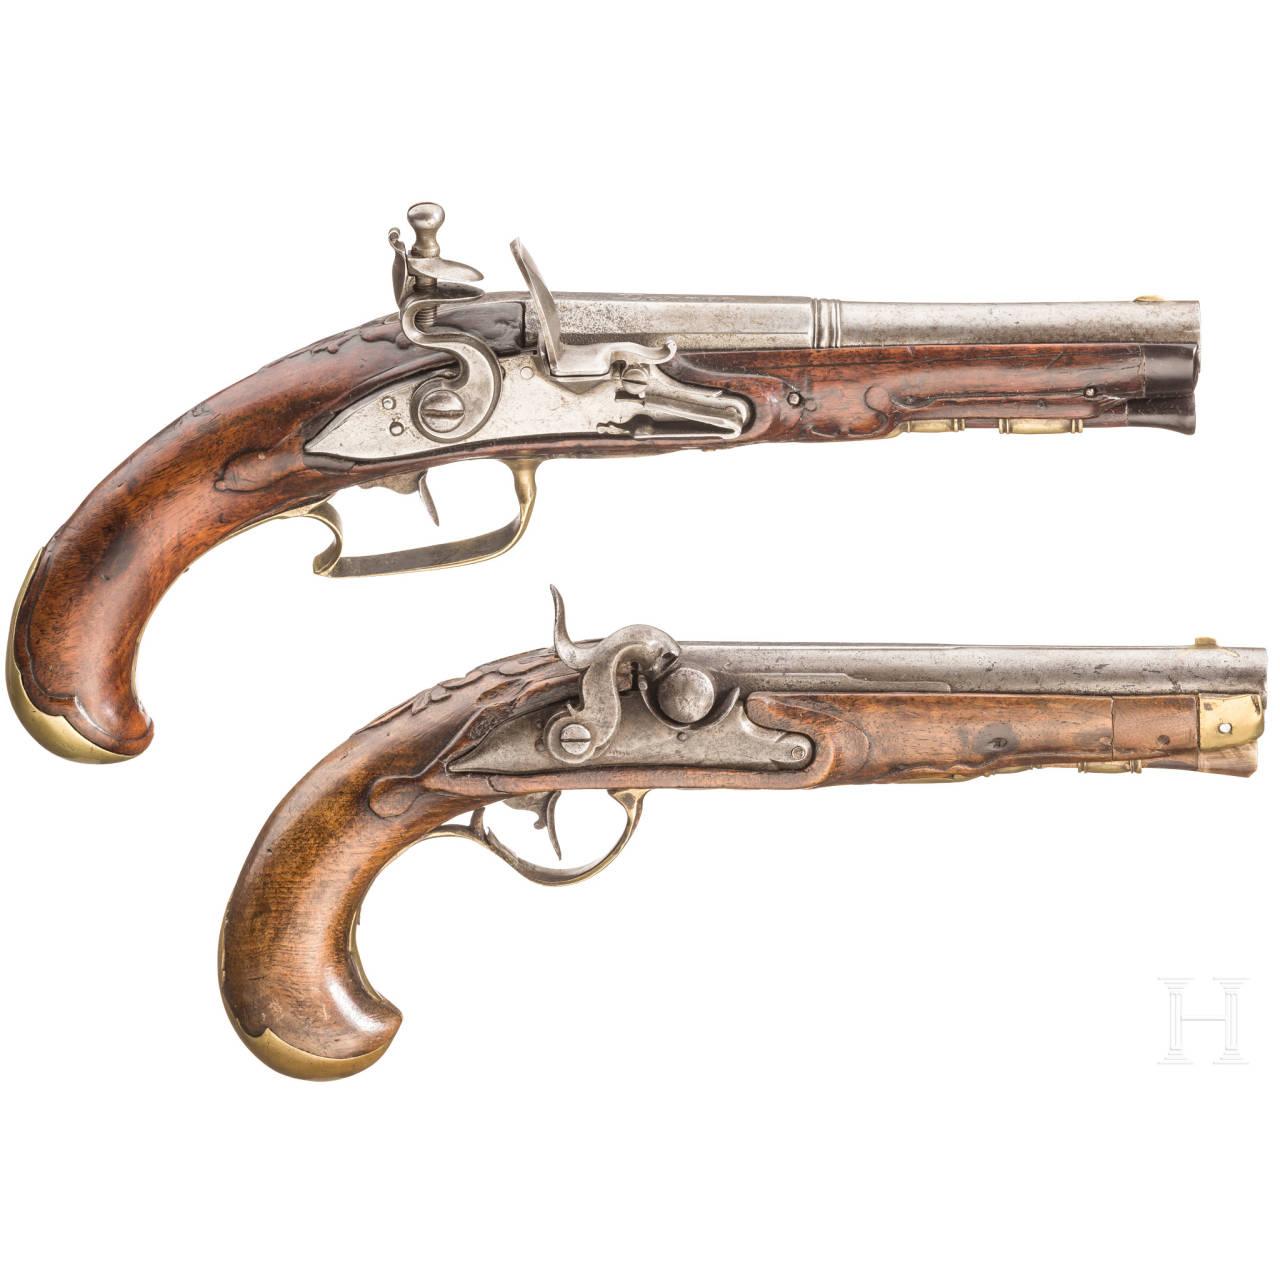 A German flintlock and a percussion pistol, ca. 1780